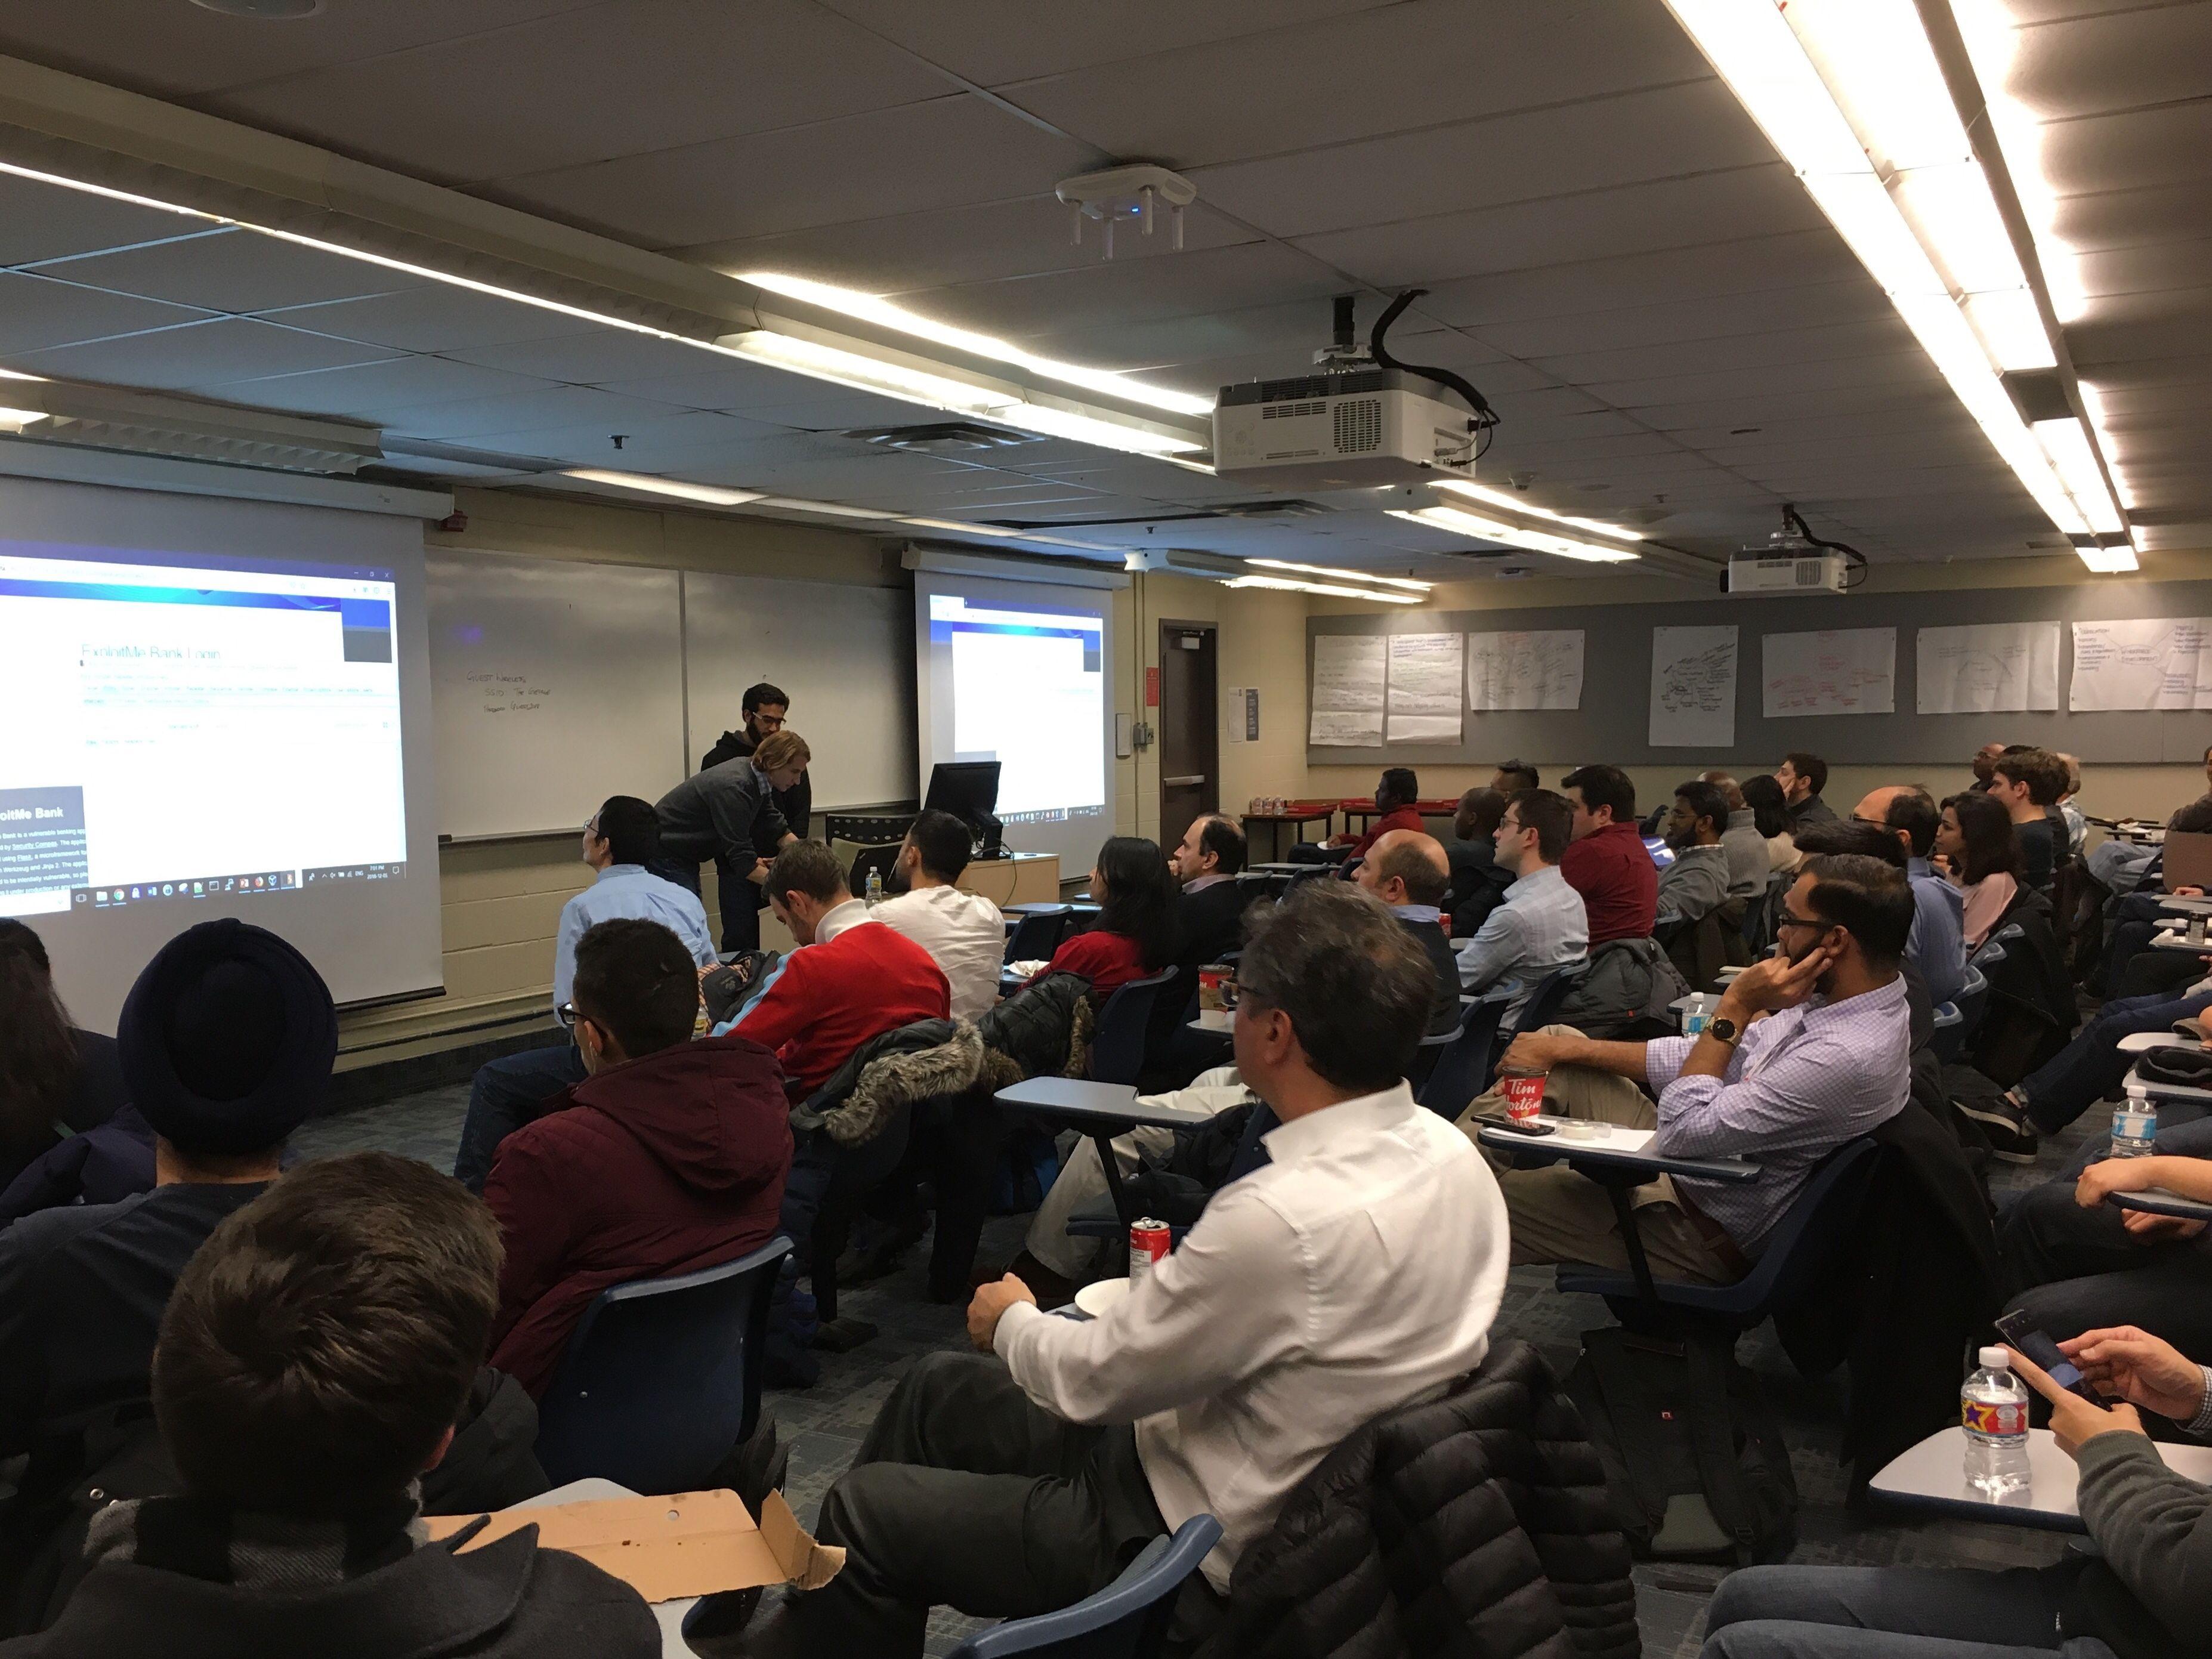 OWASP Toronto Chapter